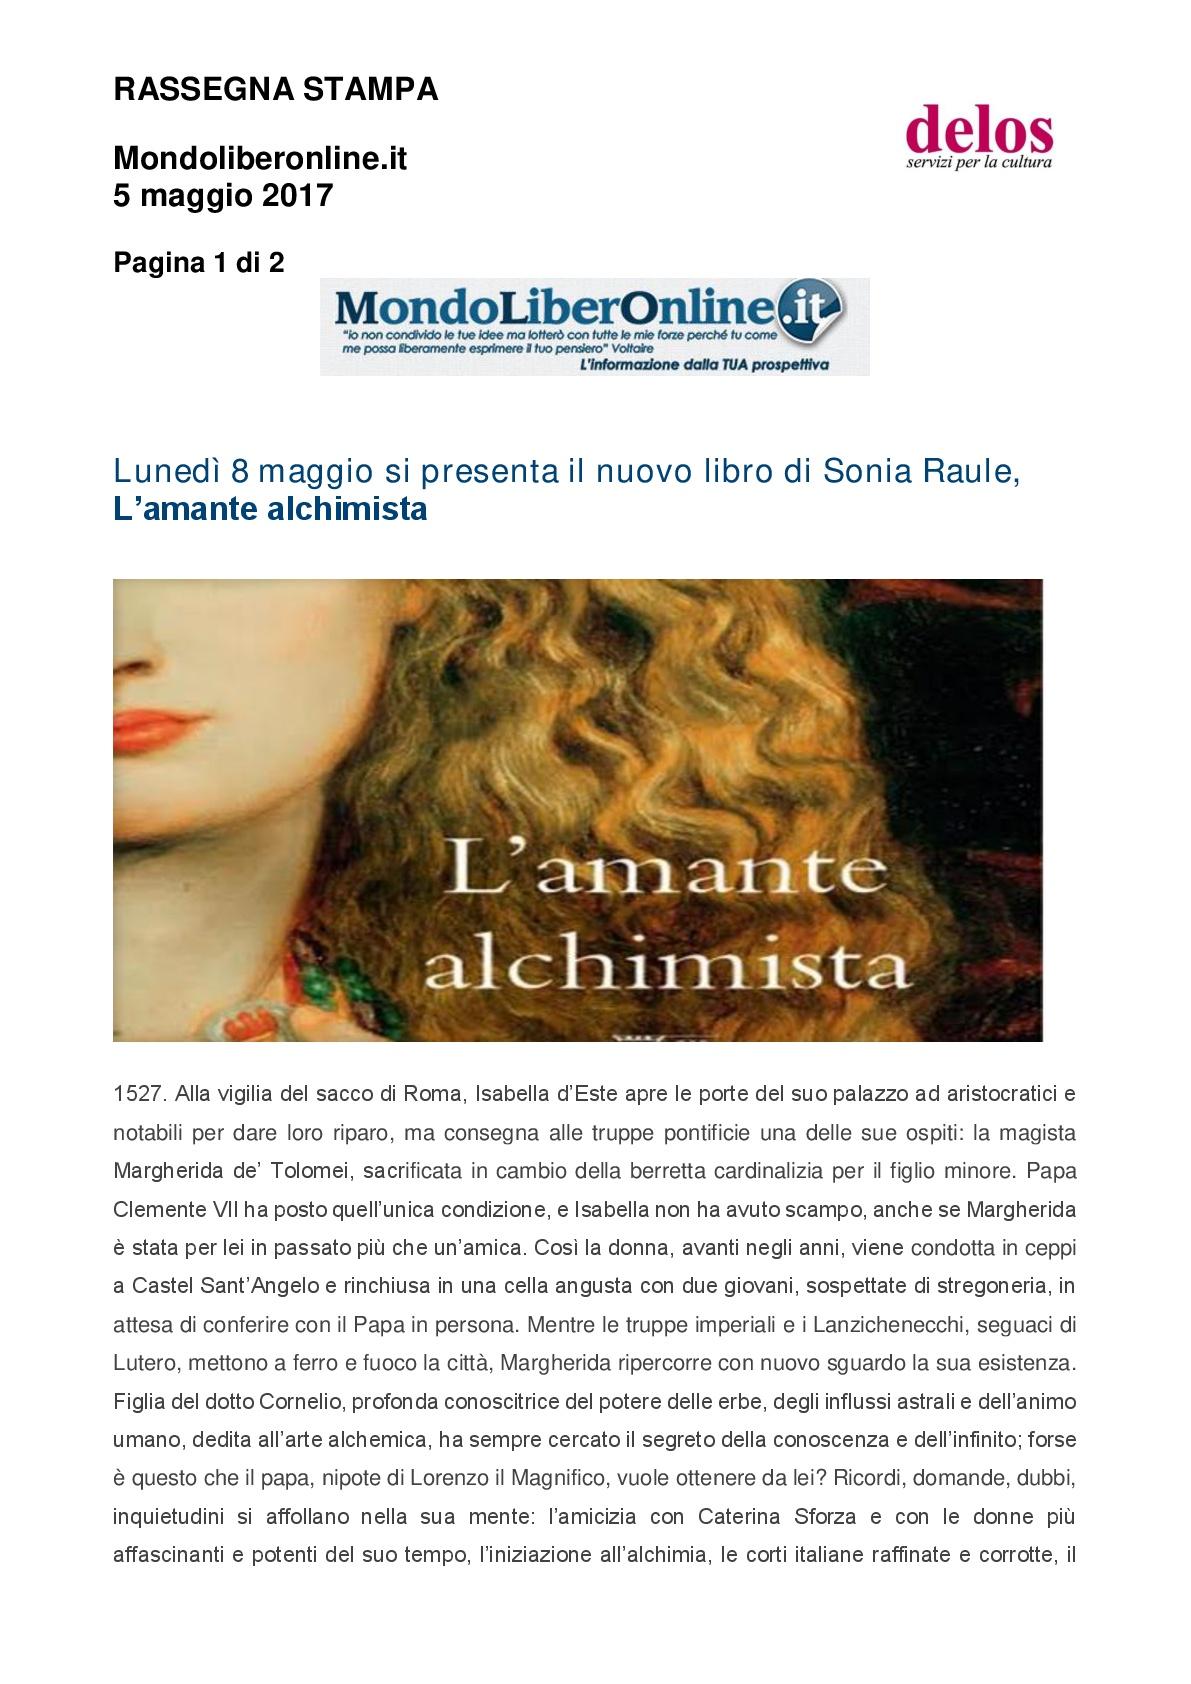 Mondoliberonline.it 05-05-2017 001